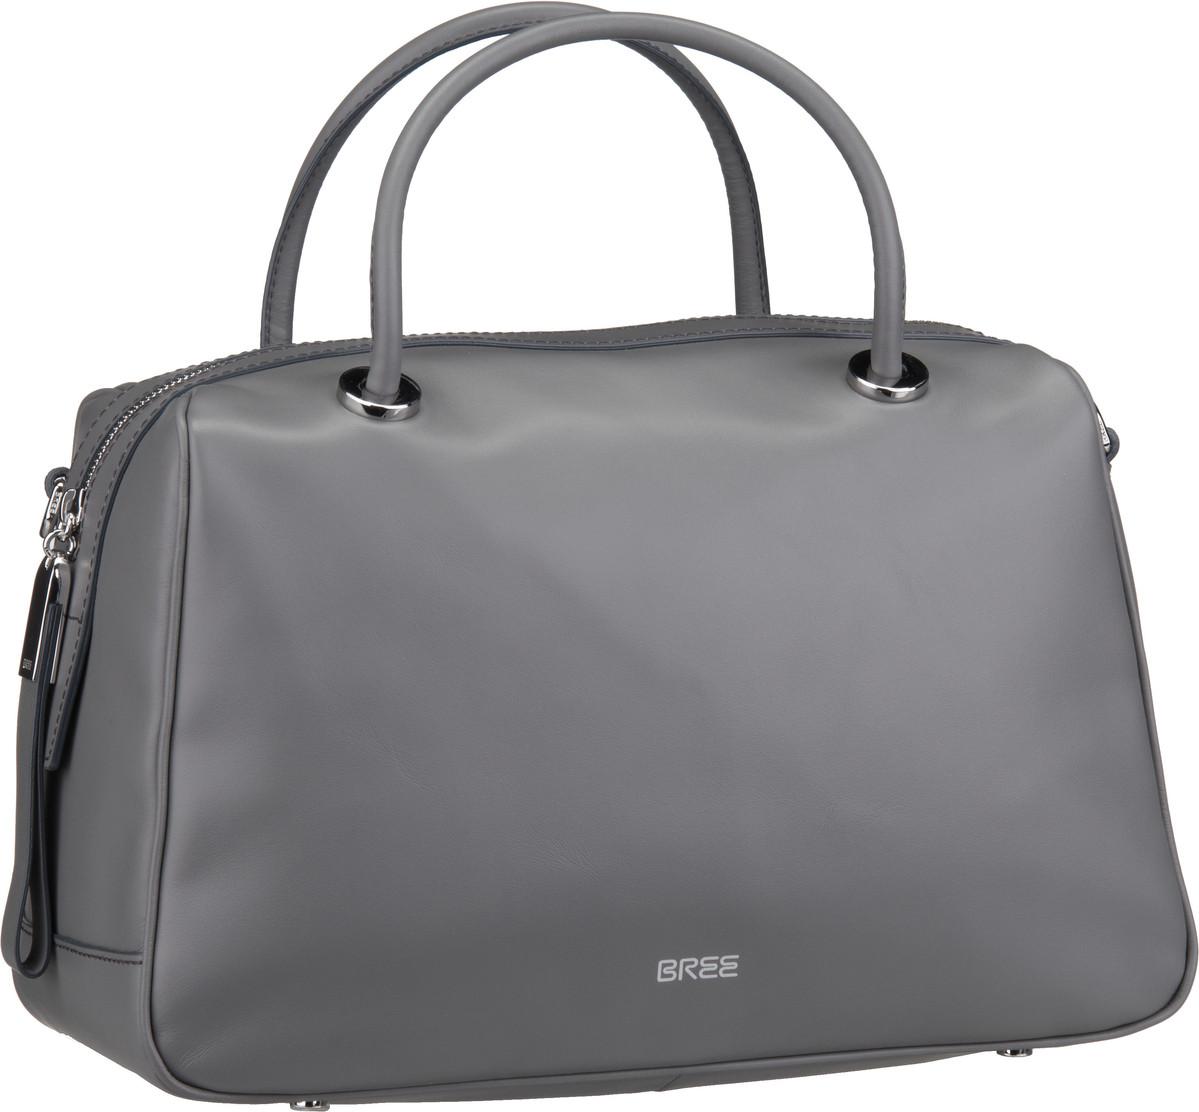 Bree Cordoba 5 Dark Grey - Handtasche